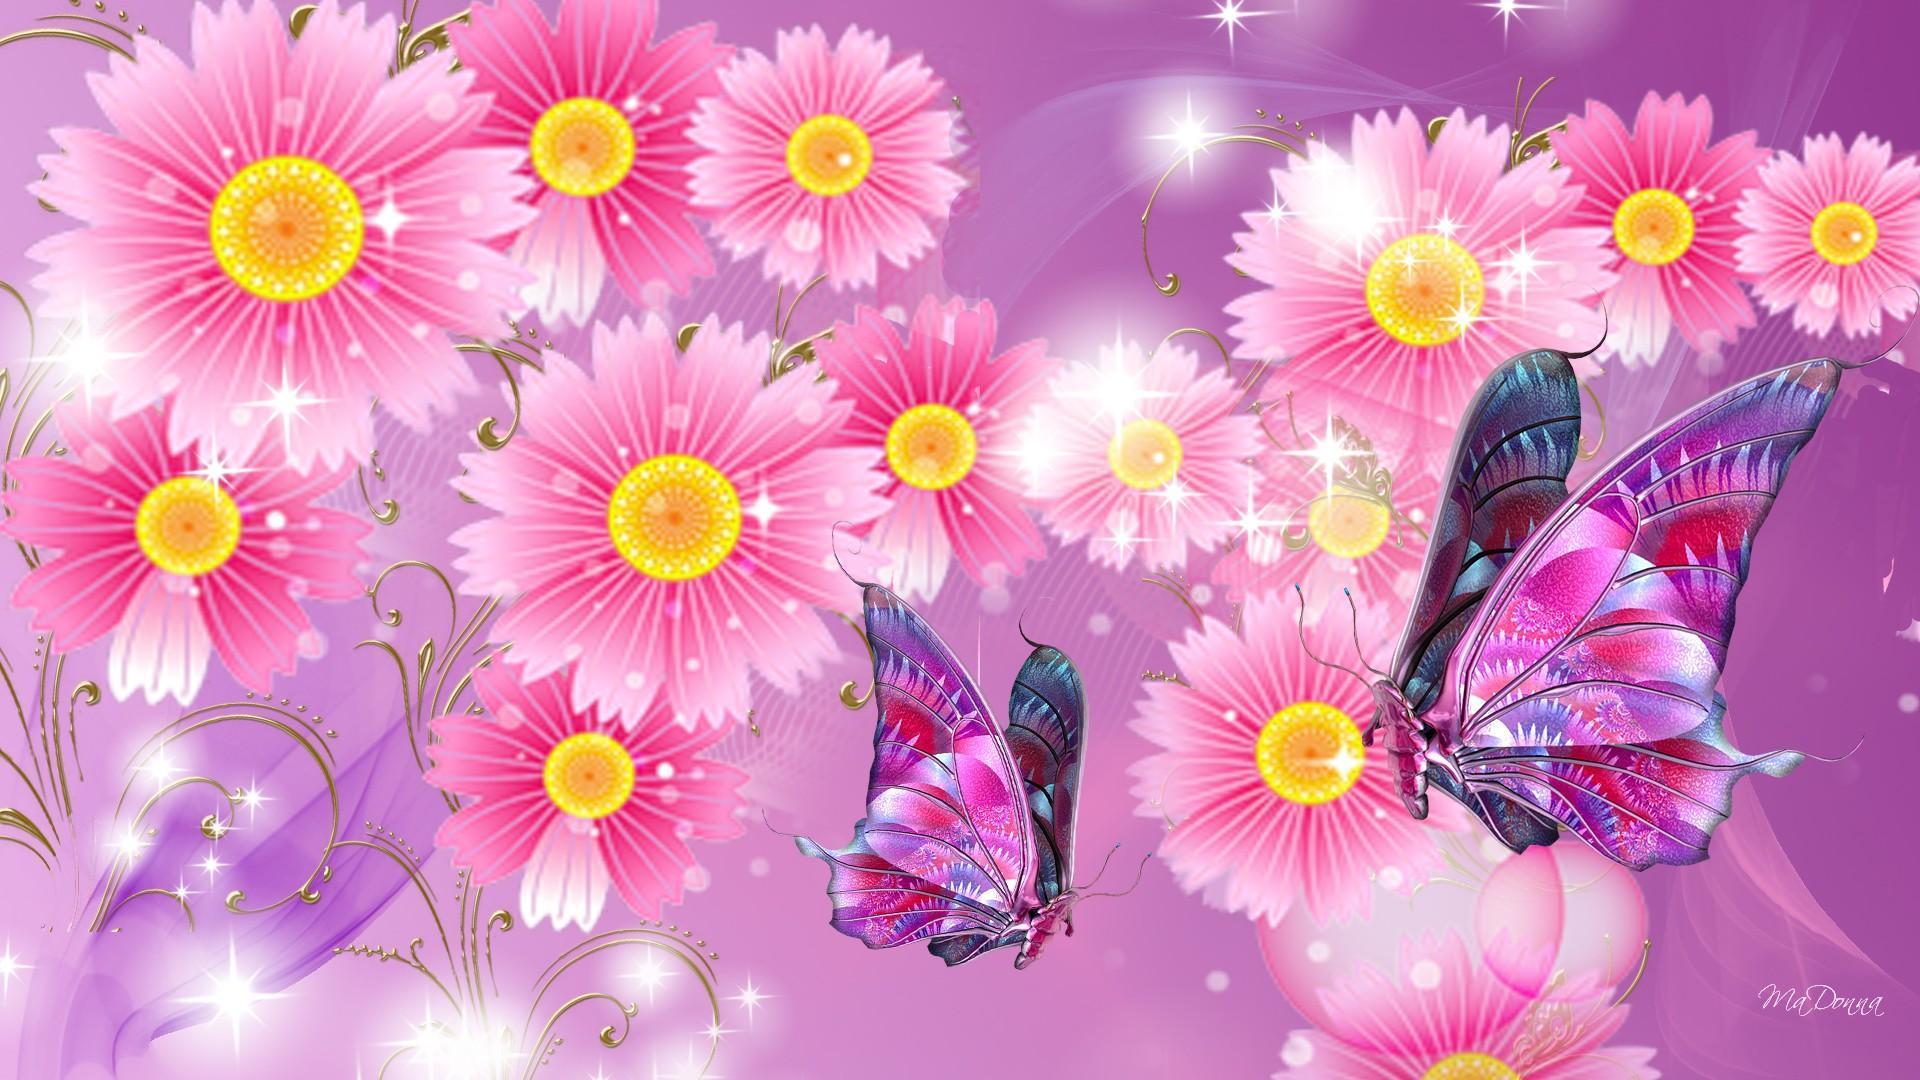 Lion Live Wallpaper Iphone Brillare Di Fiori Rosa Carta Da Parati Desktop Hd